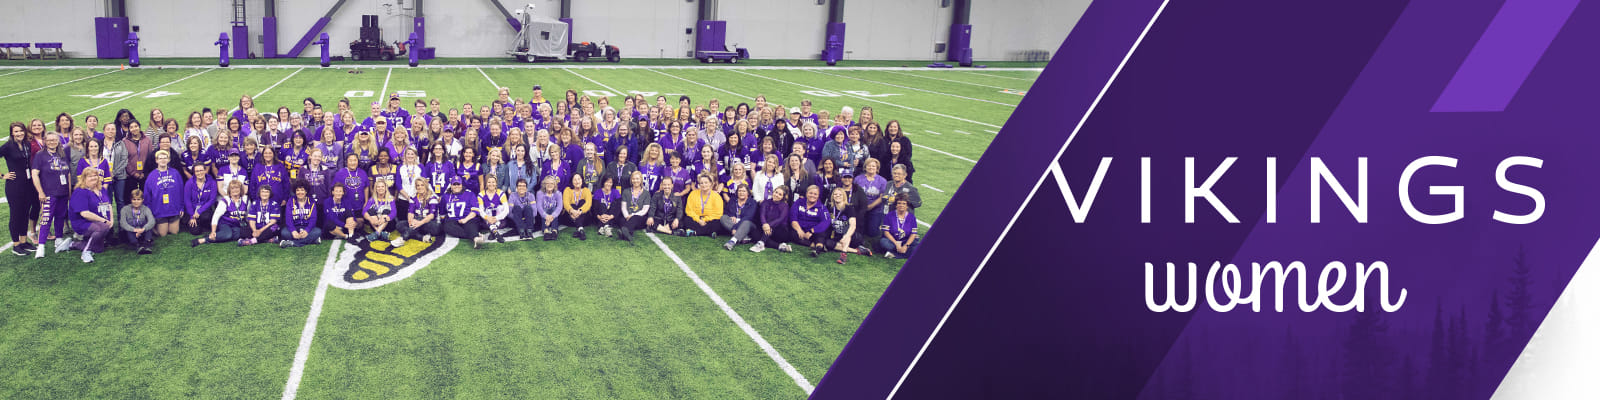 Vikings Women Home   Minnesota Vikings – vikings com